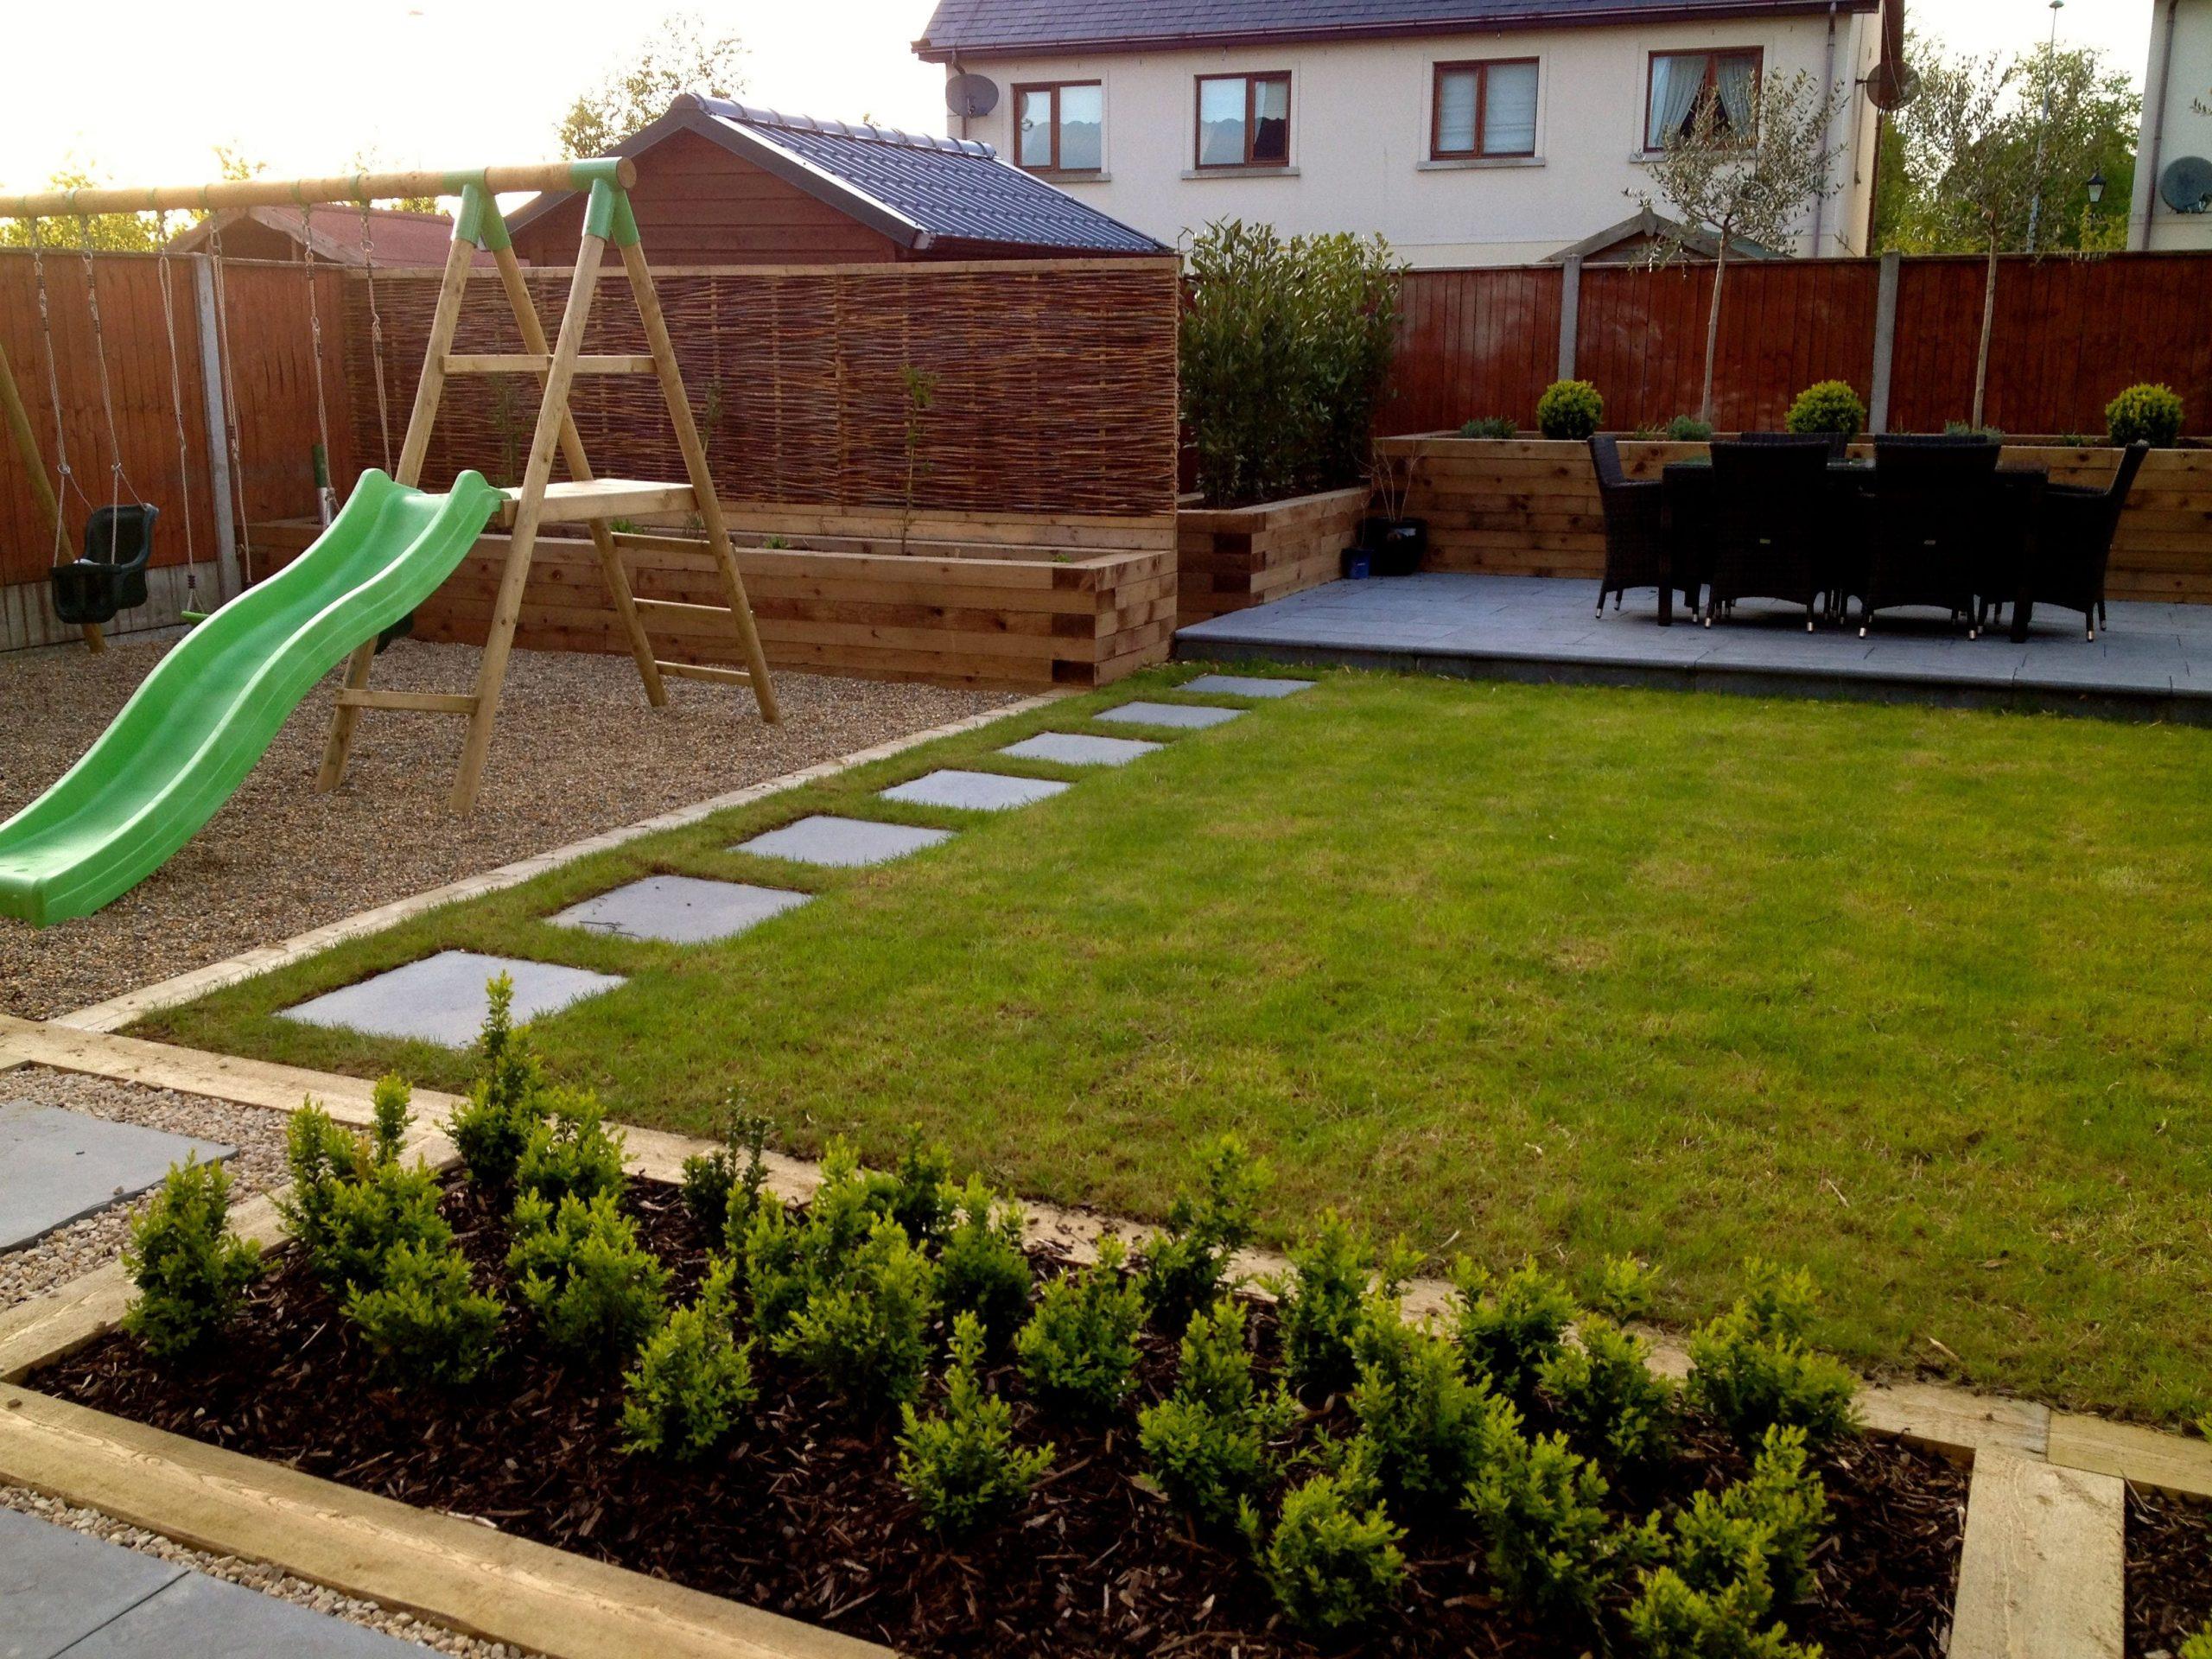 Simphome.comestablishing a budget for garden design landscaping pinterest for garden design ideas on a budget